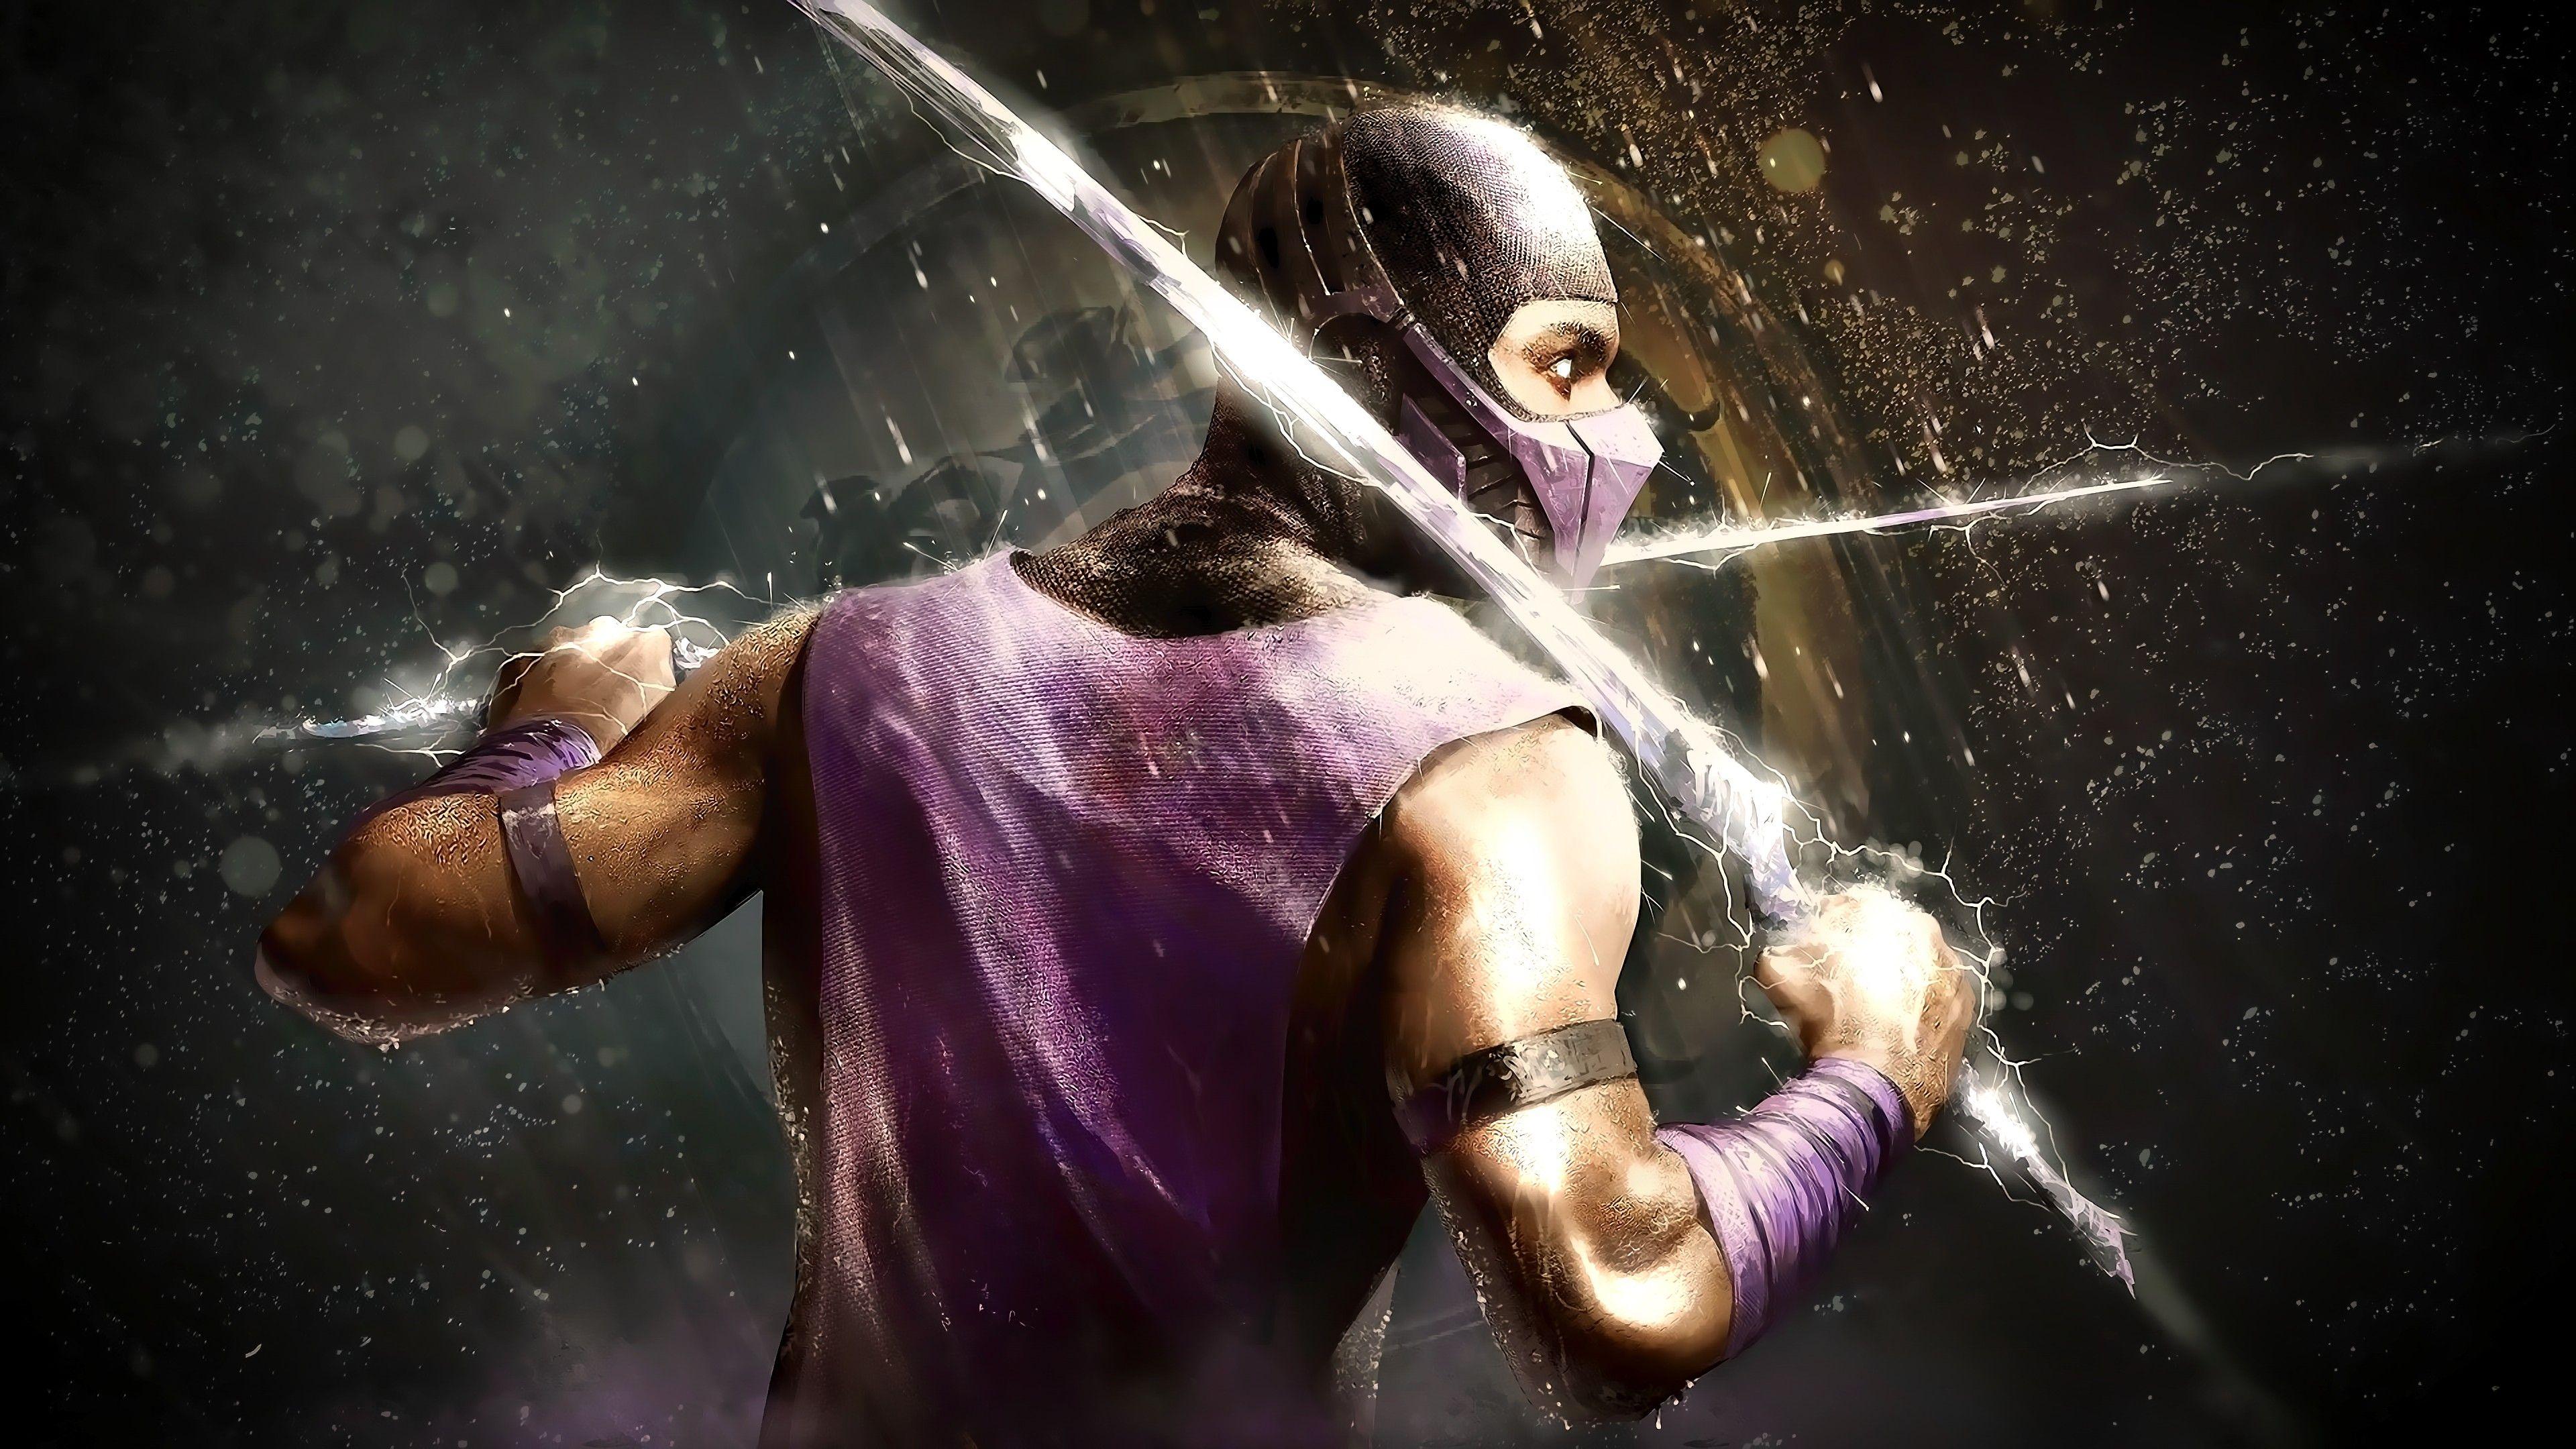 General 3840x2160 Mortal Kombat Rain Scorpion Mortal Kombat Art Mortal Kombat X Mortal Kombat Characters